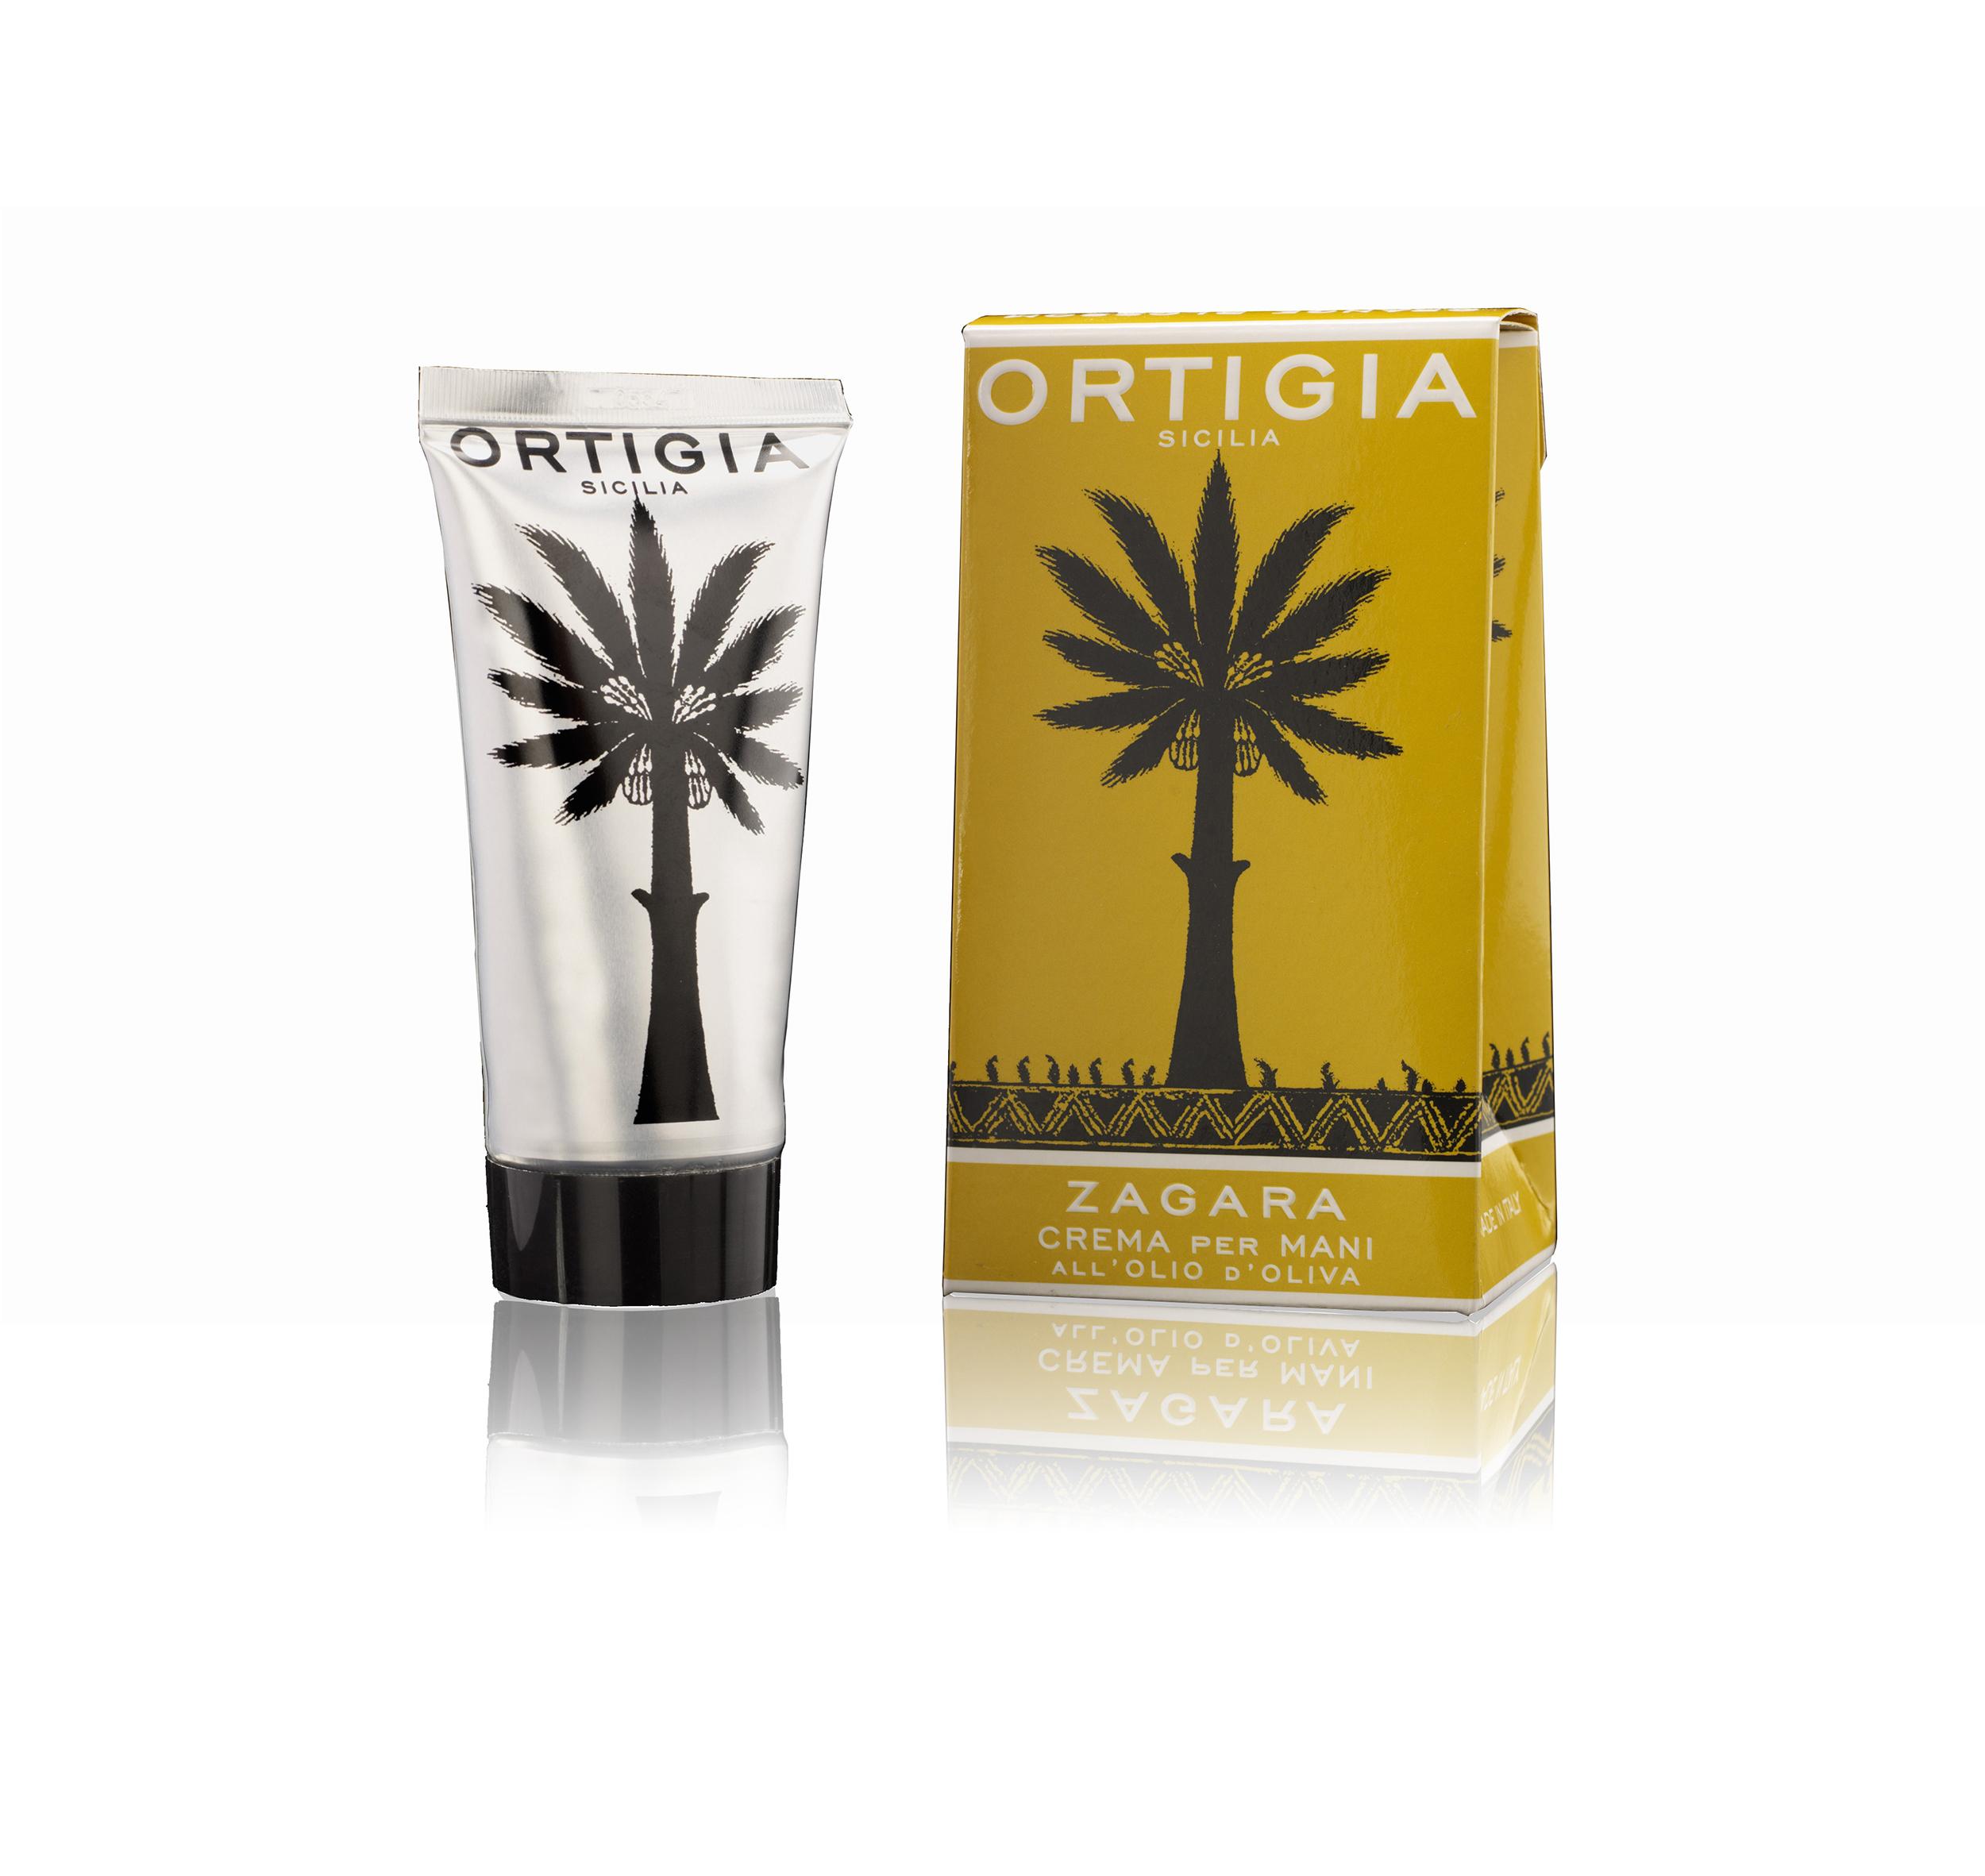 Ortigia Zagara D'India Hand Cream  £16.00